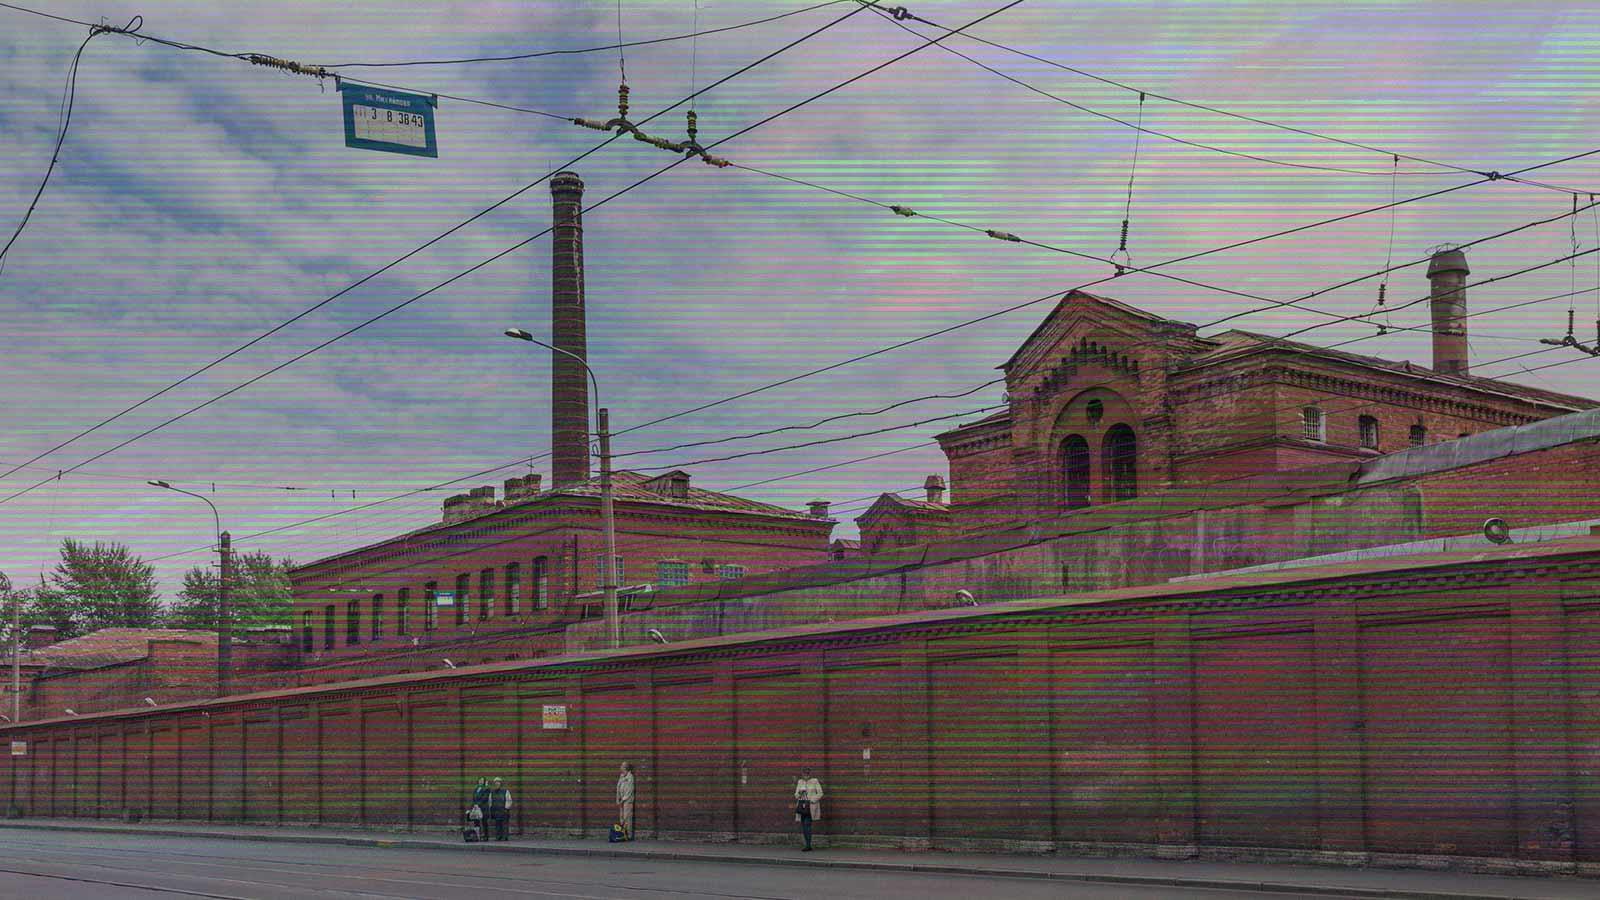 Photo: Kresty Prison Saint Petersburg, Russia. Credit: Ninara, Wikimedia Commons.